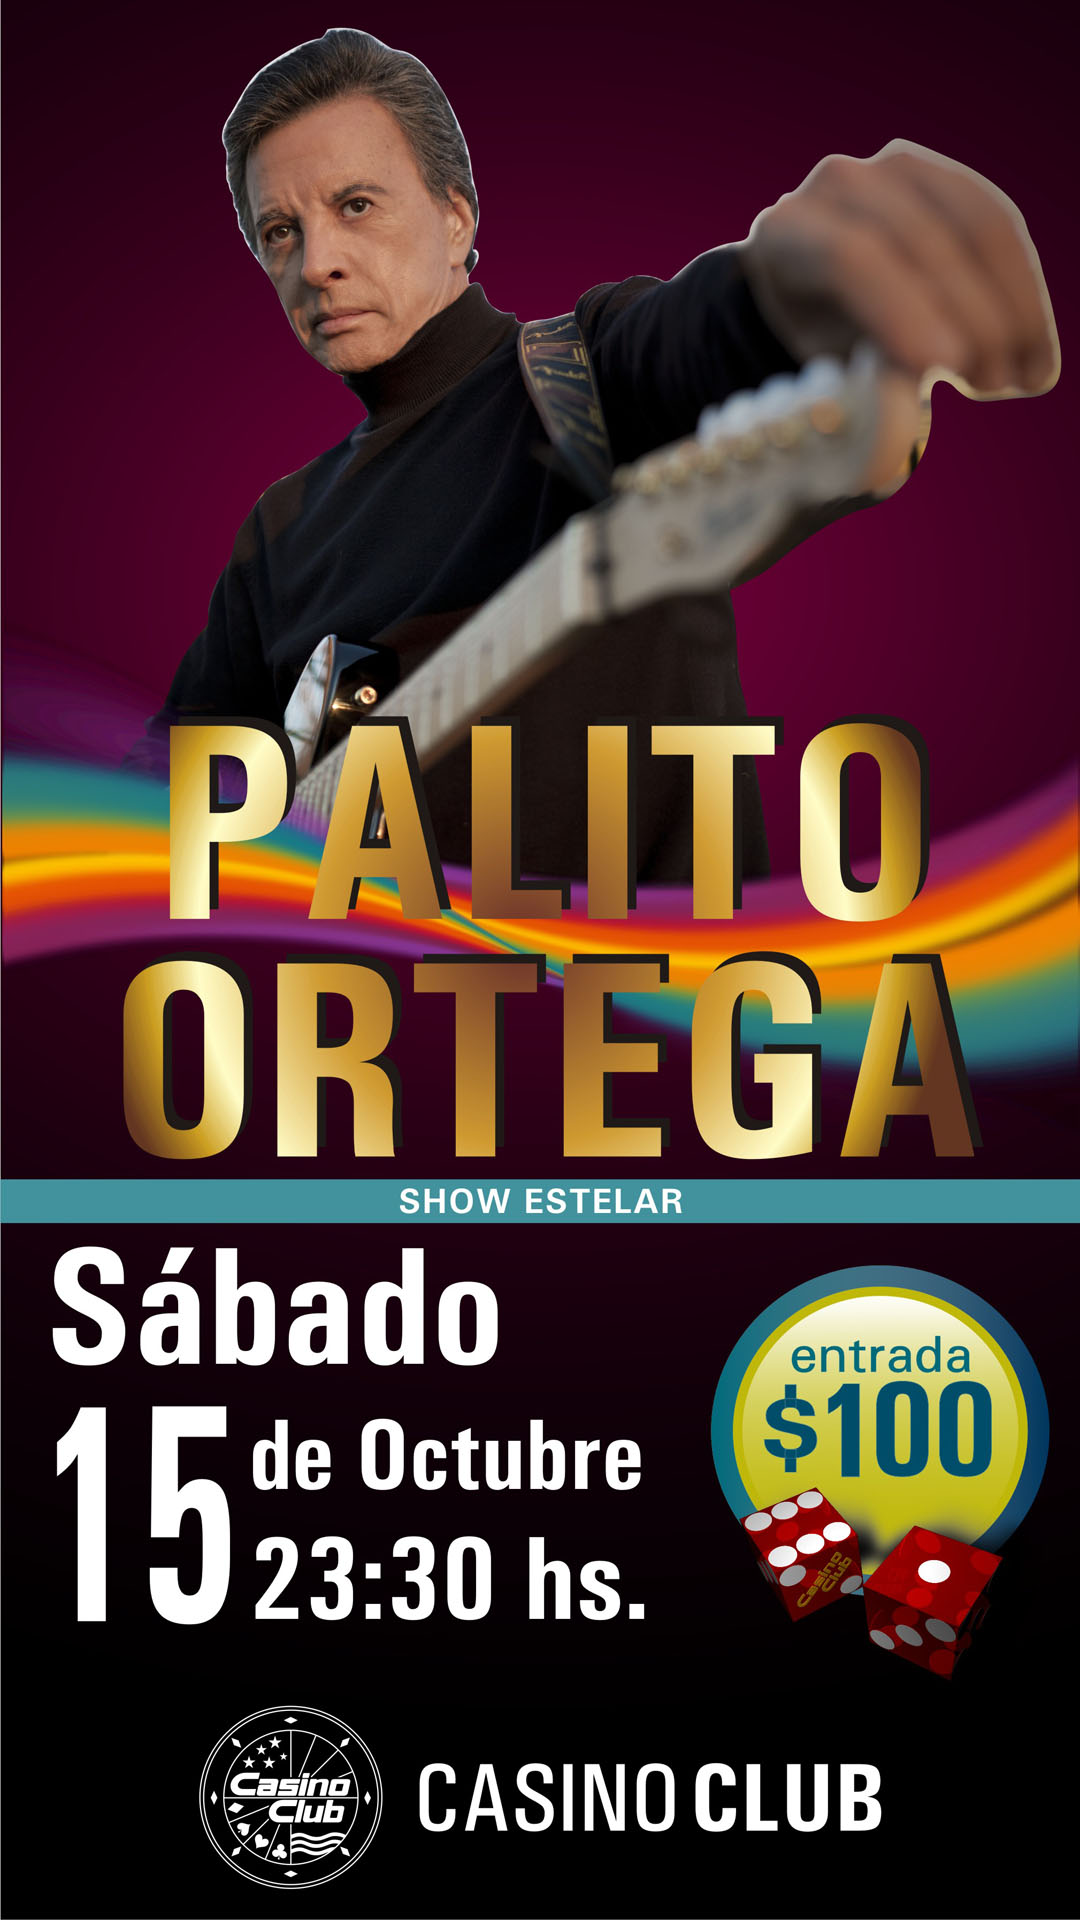 Palito Ortega 15-10-2016